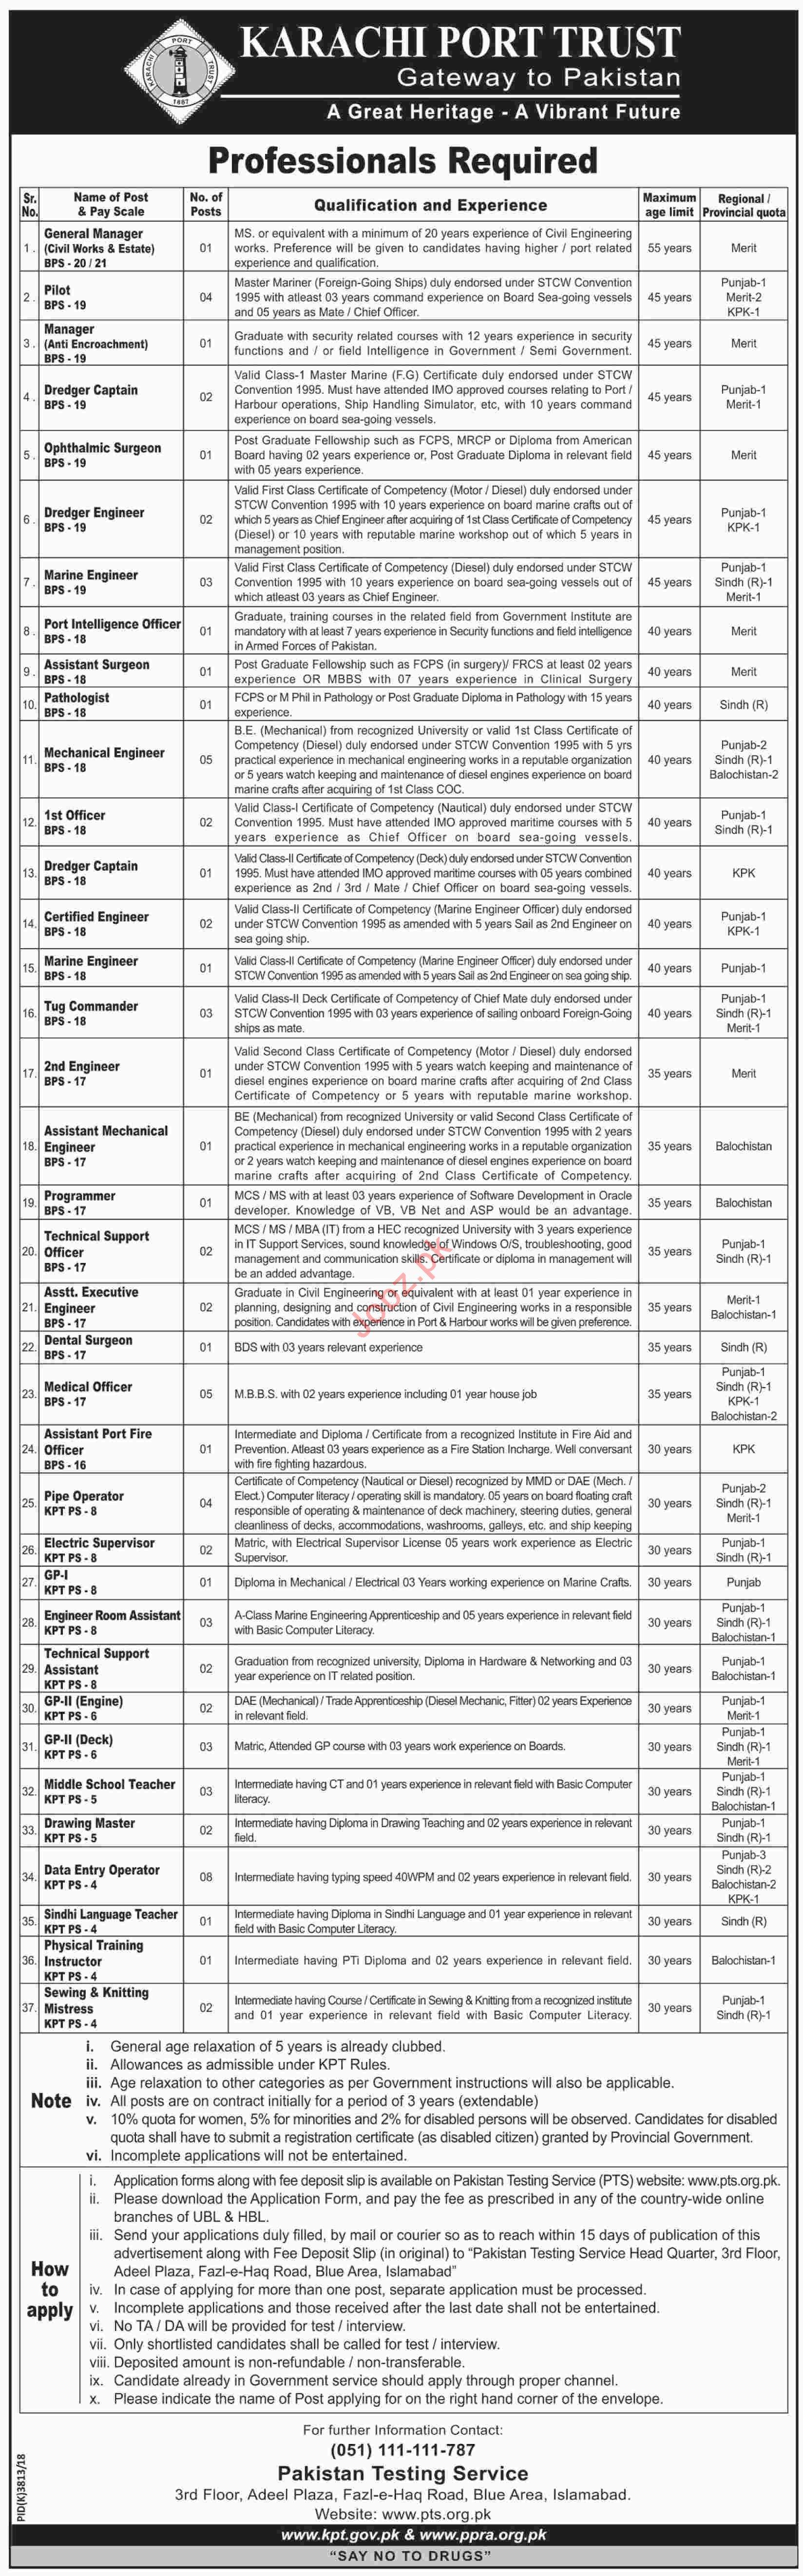 Karachi Port Trust KPT Jobs 2019